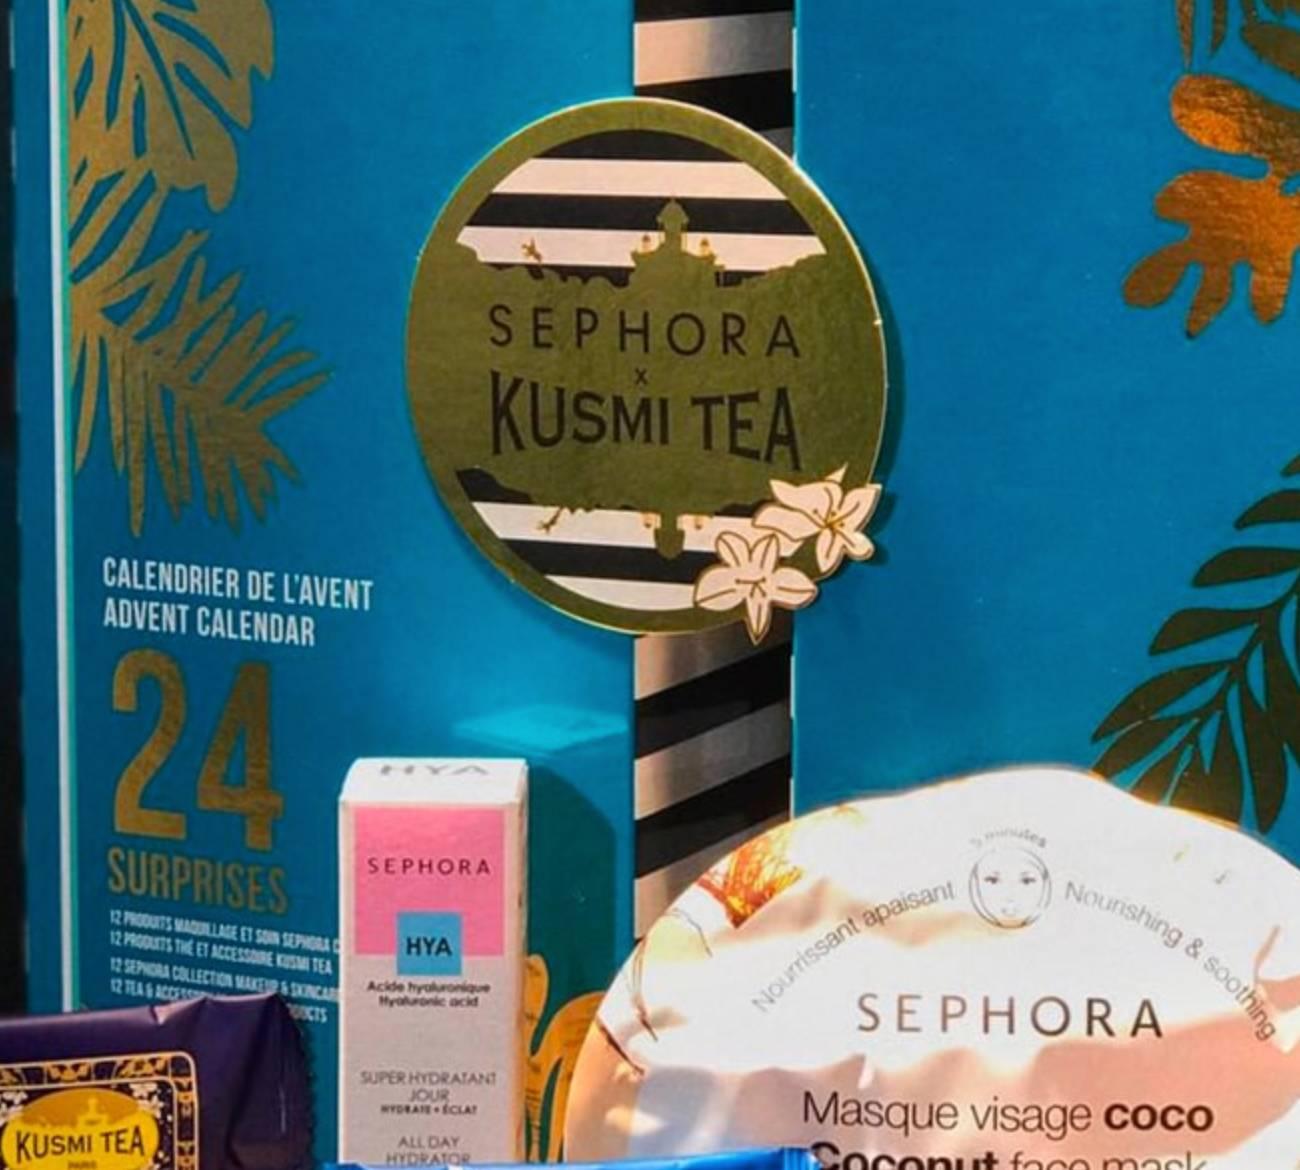 calendario adviento sephora kusmi tea